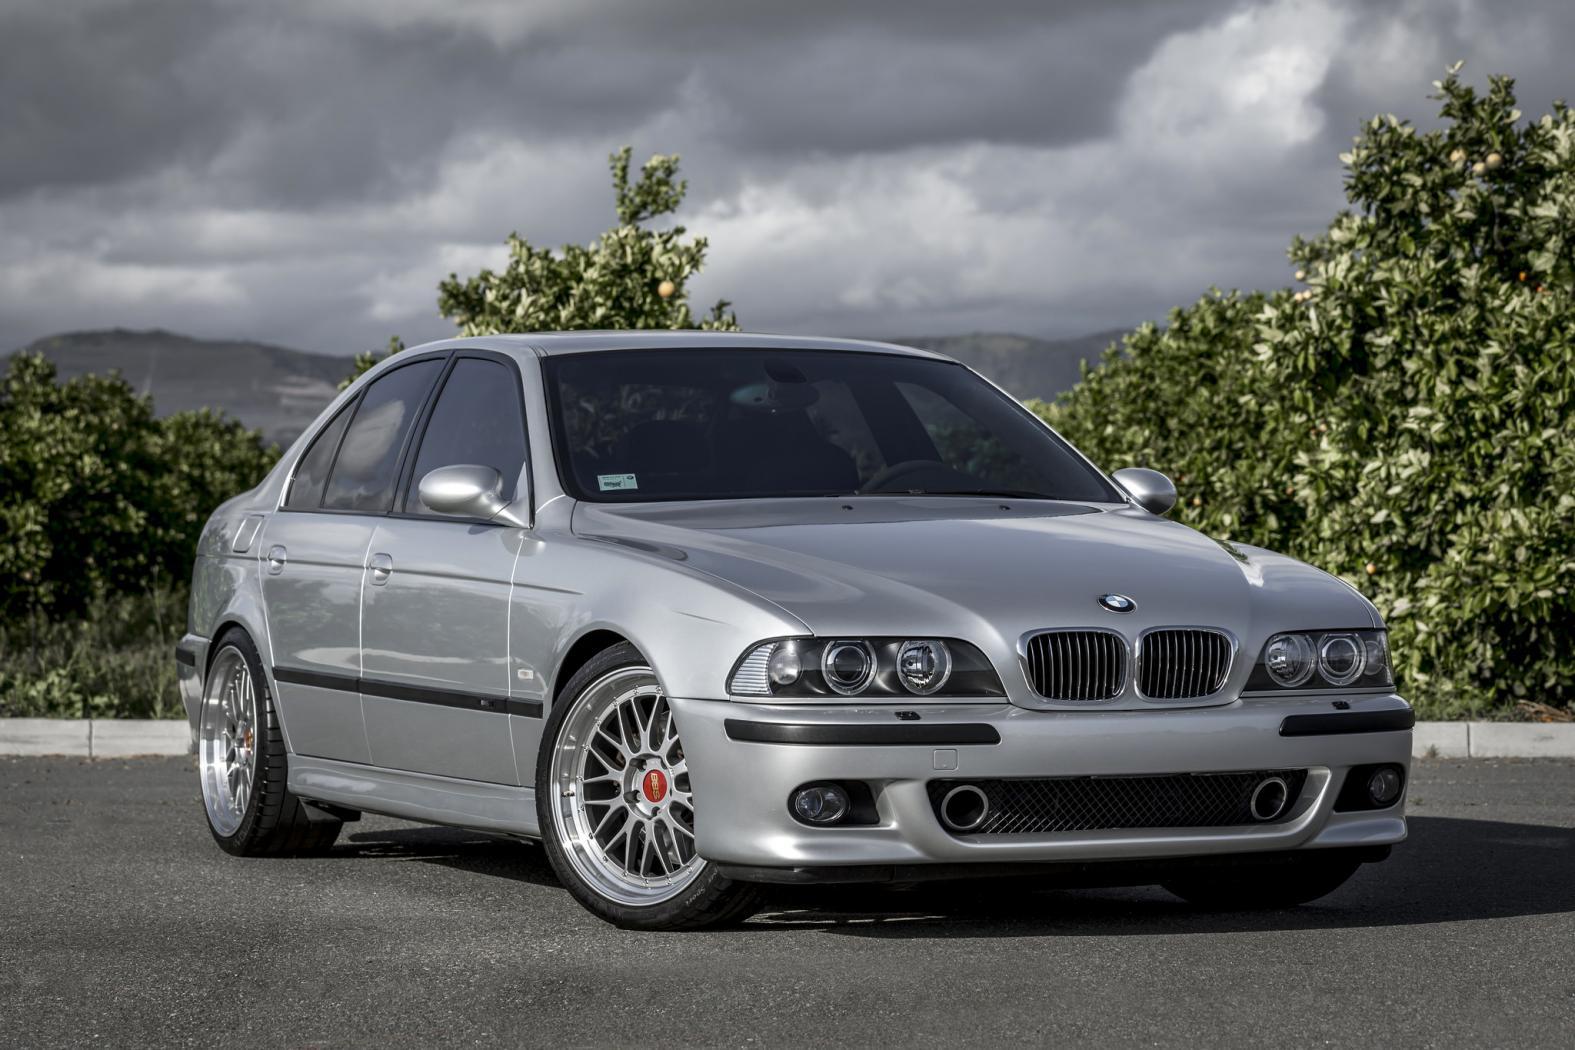 BMW-M5-E39-3_20170925-1600.jpeg